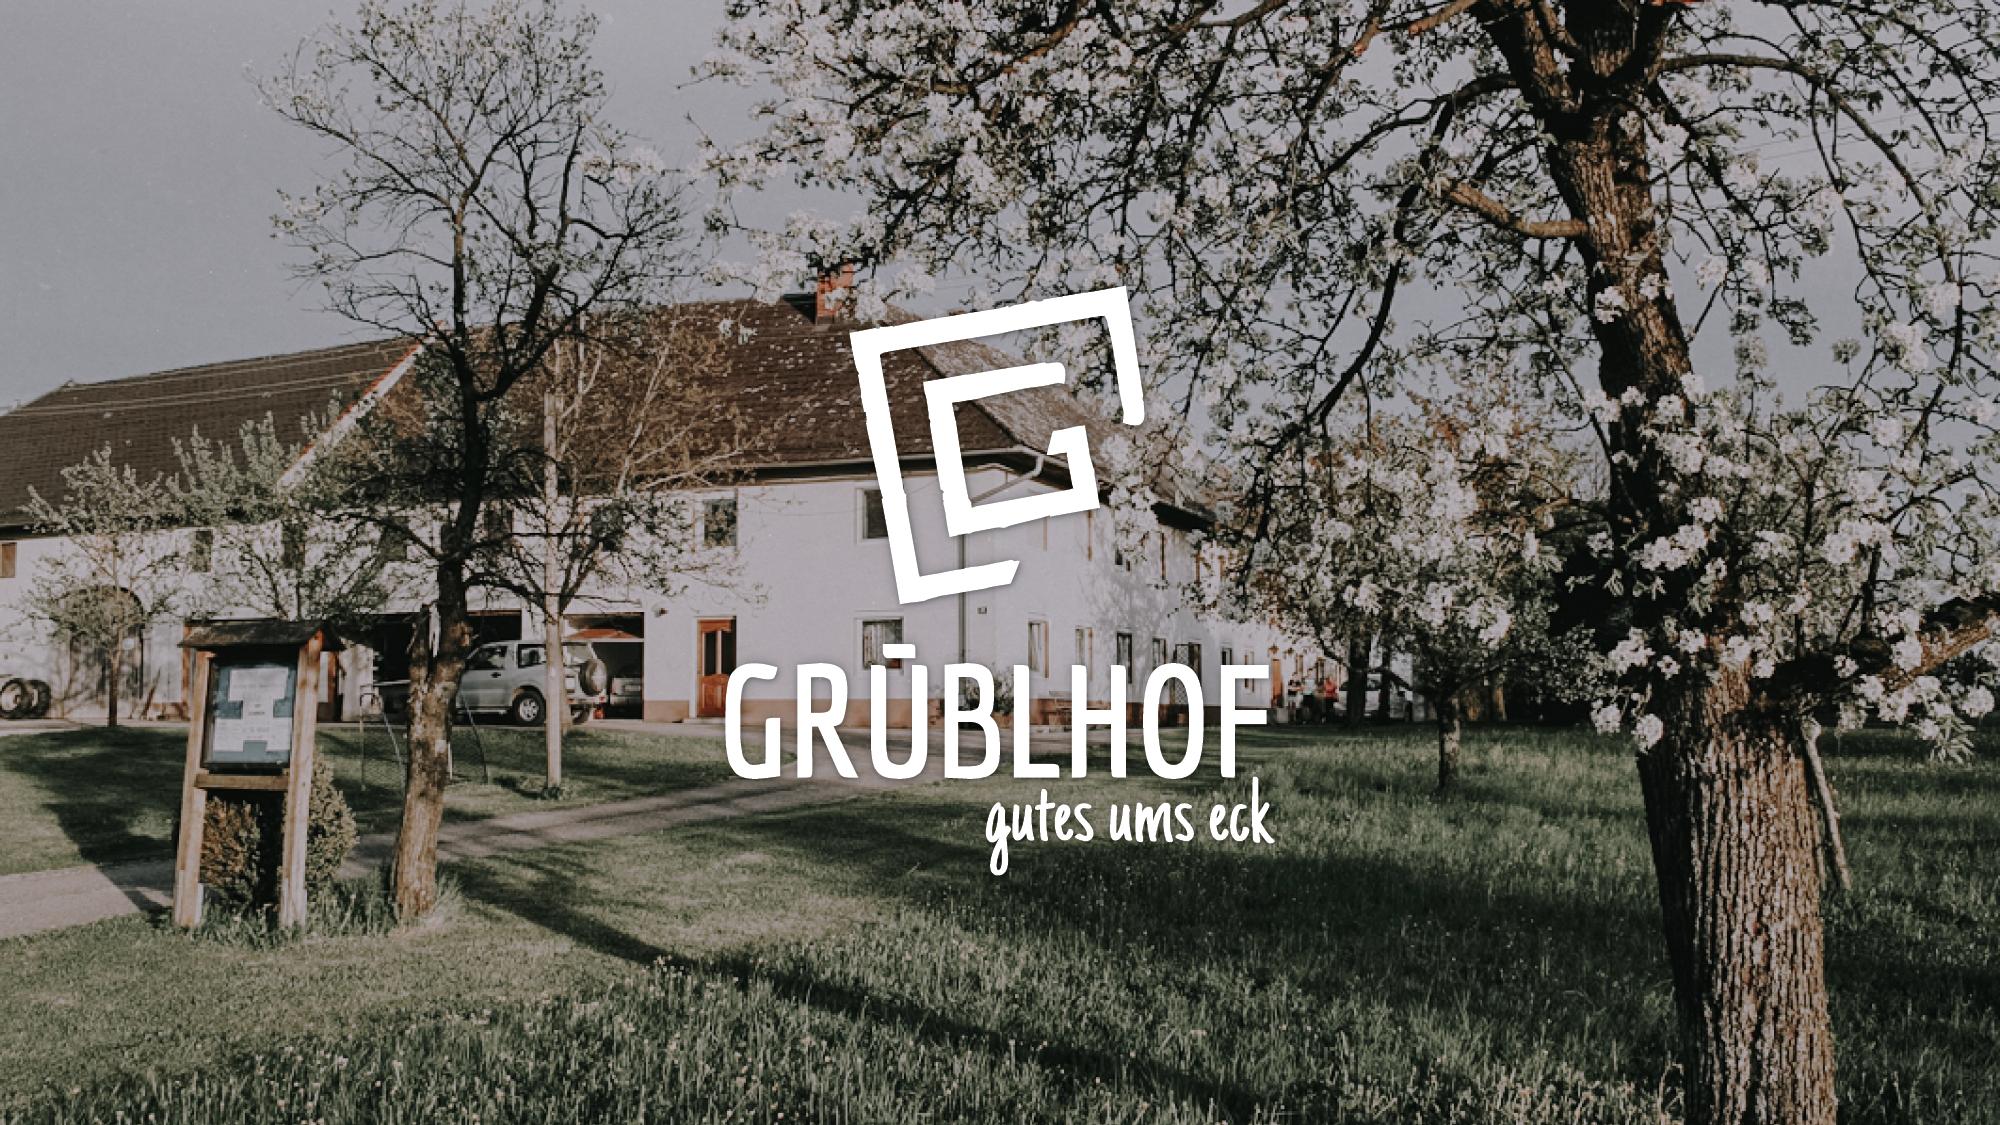 Grueblhof